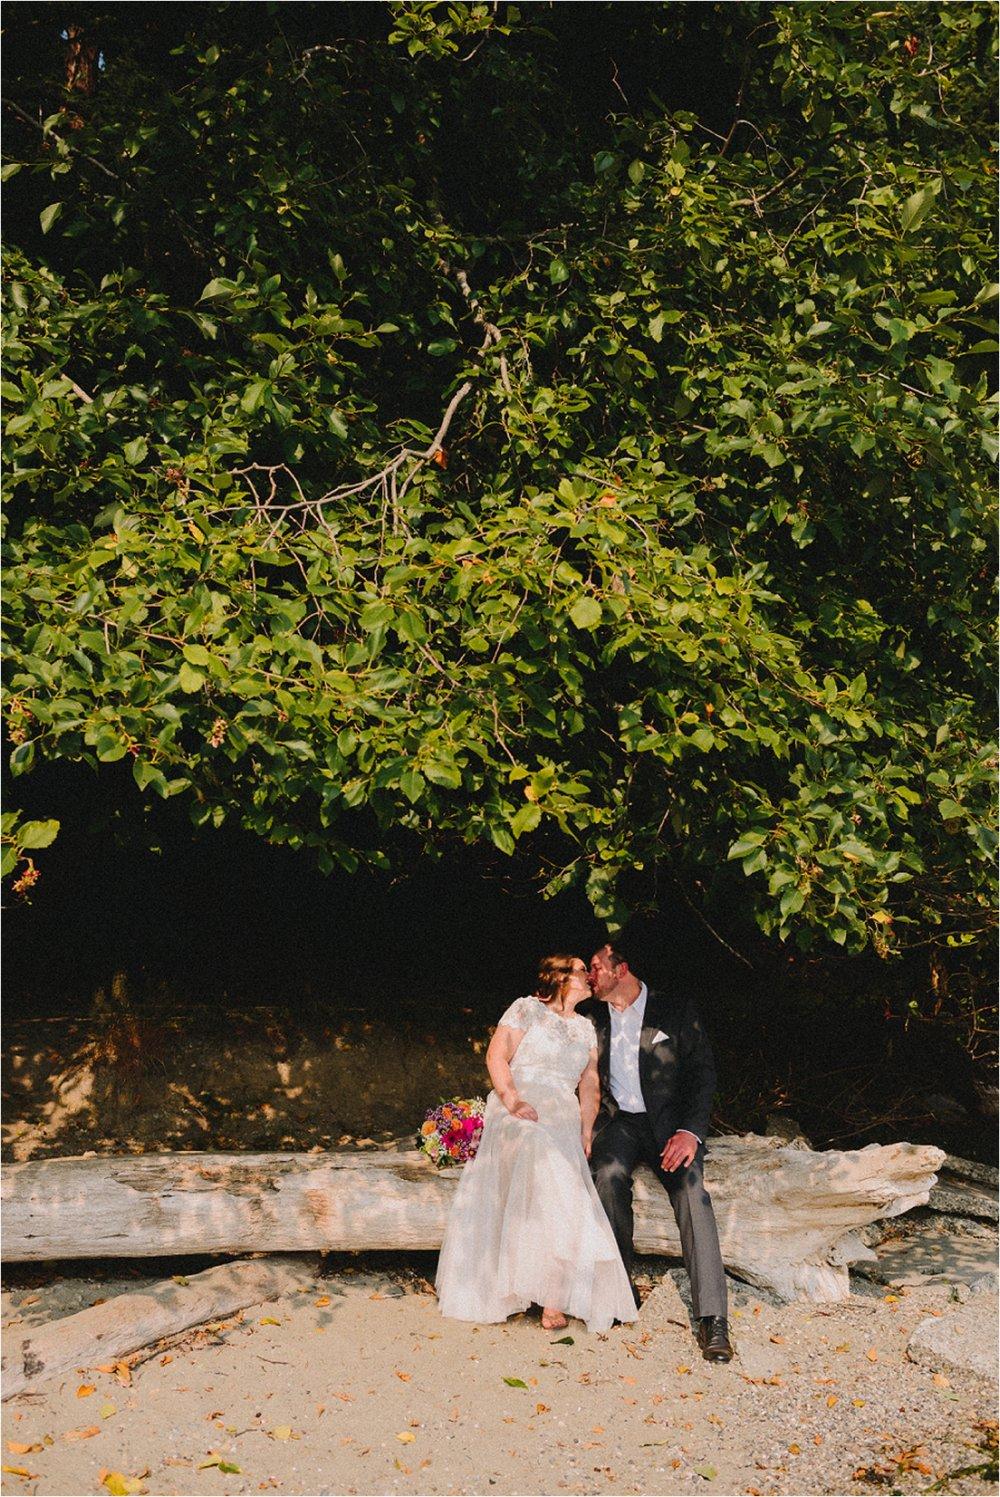 owen-beach-priest-point-park-tacoma-washington-elopement-jannicka-mayte-anchorage-alaska-wedding-elopement-photographer (6).jpg